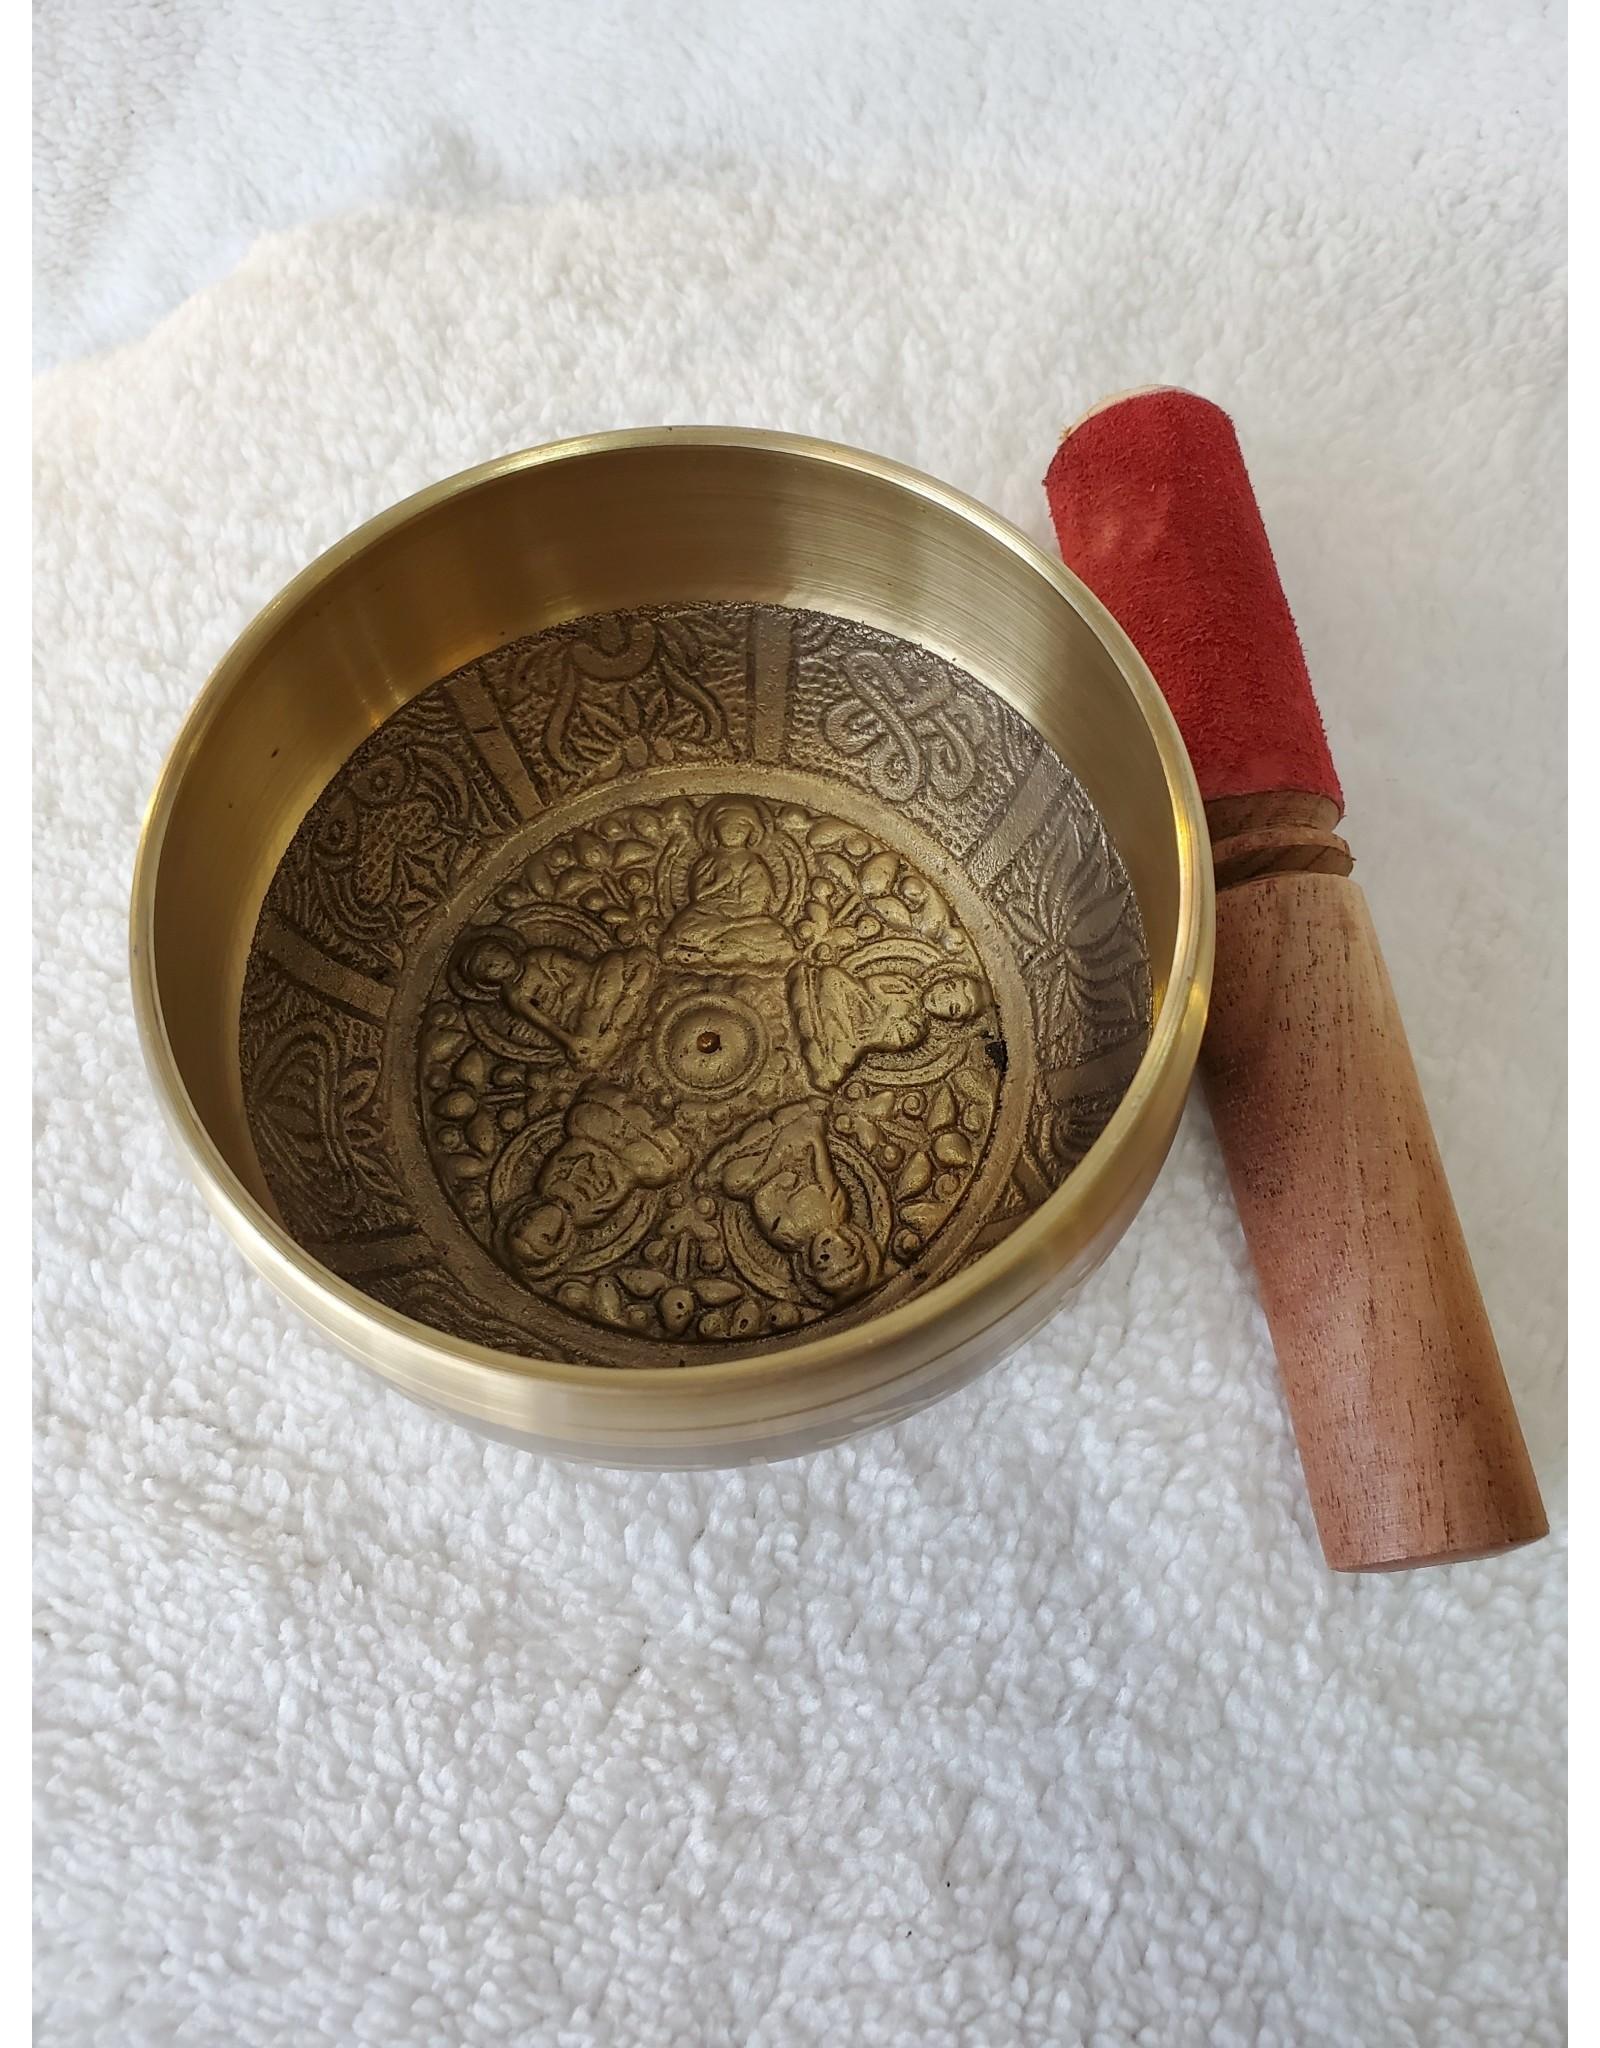 Medium Singing Bowl - Mandala Design